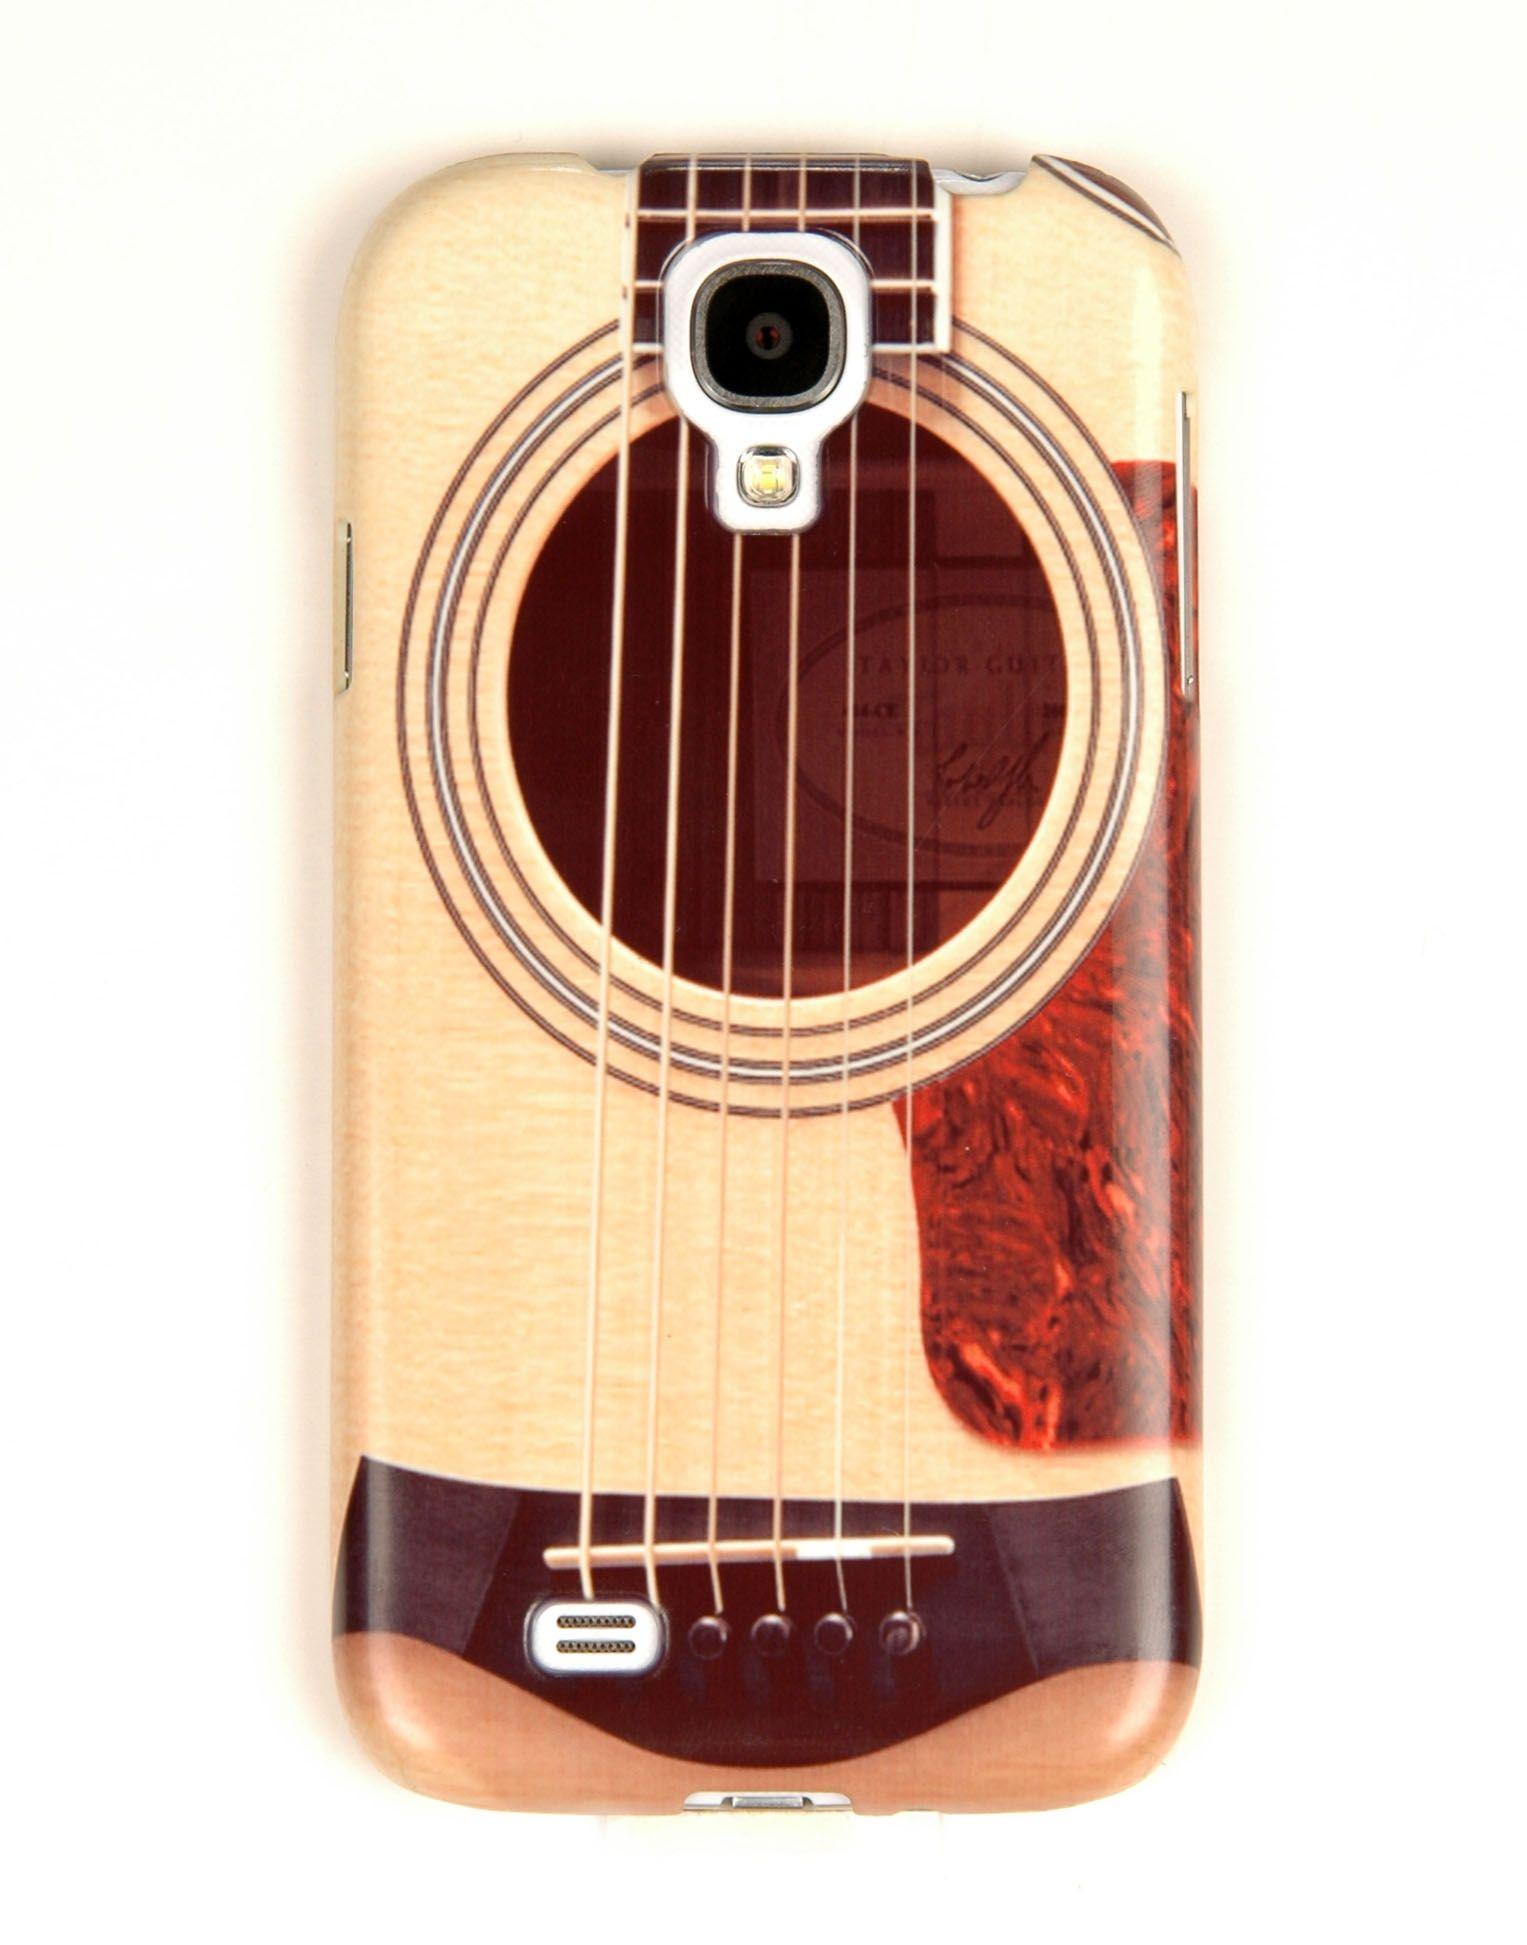 Samsung Galaxy S4 Custom Guitar Design Case. Samsung Galaxy S4 Bikapakal.com Özel Gitar Dizaynı. Sadece 29.99 TL bikapakal.com